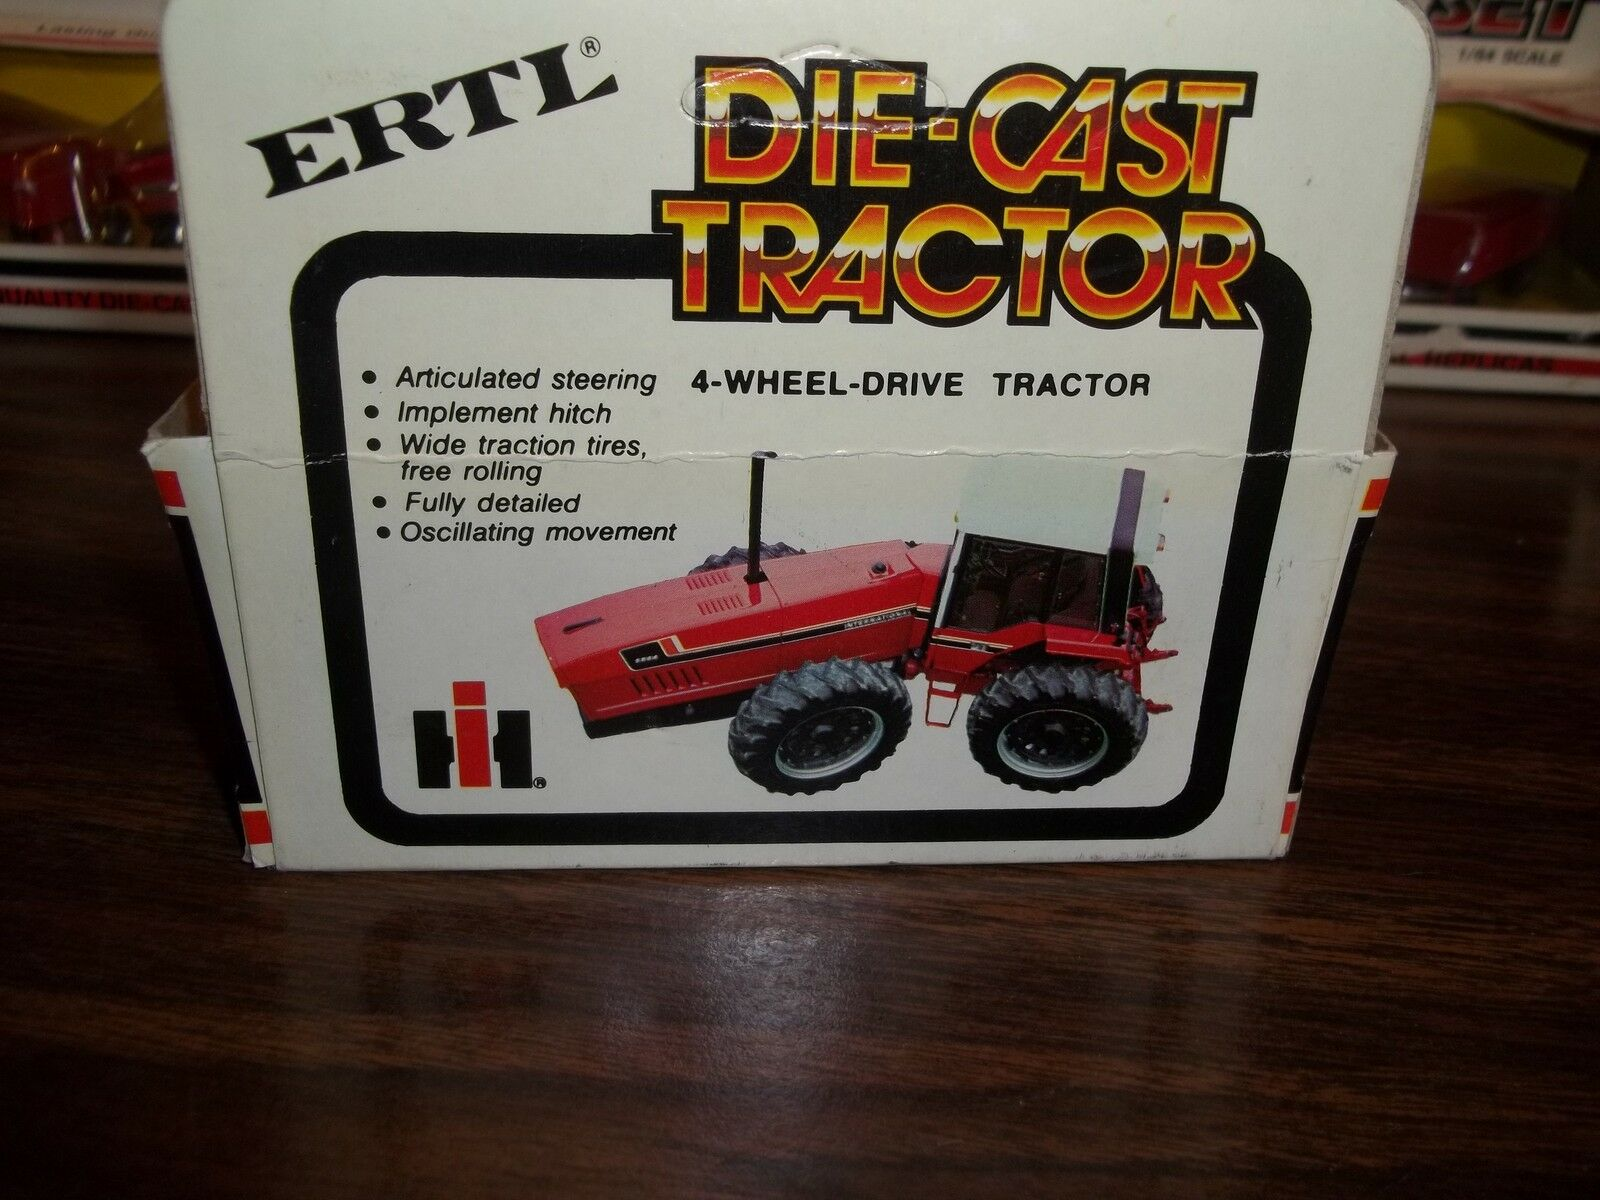 ERTL 1/64 SCALE DIE-CAST INTERNATIONAL 6388 2+2 4-WHEEL-DRIVE TRACTOR PART#1526 2